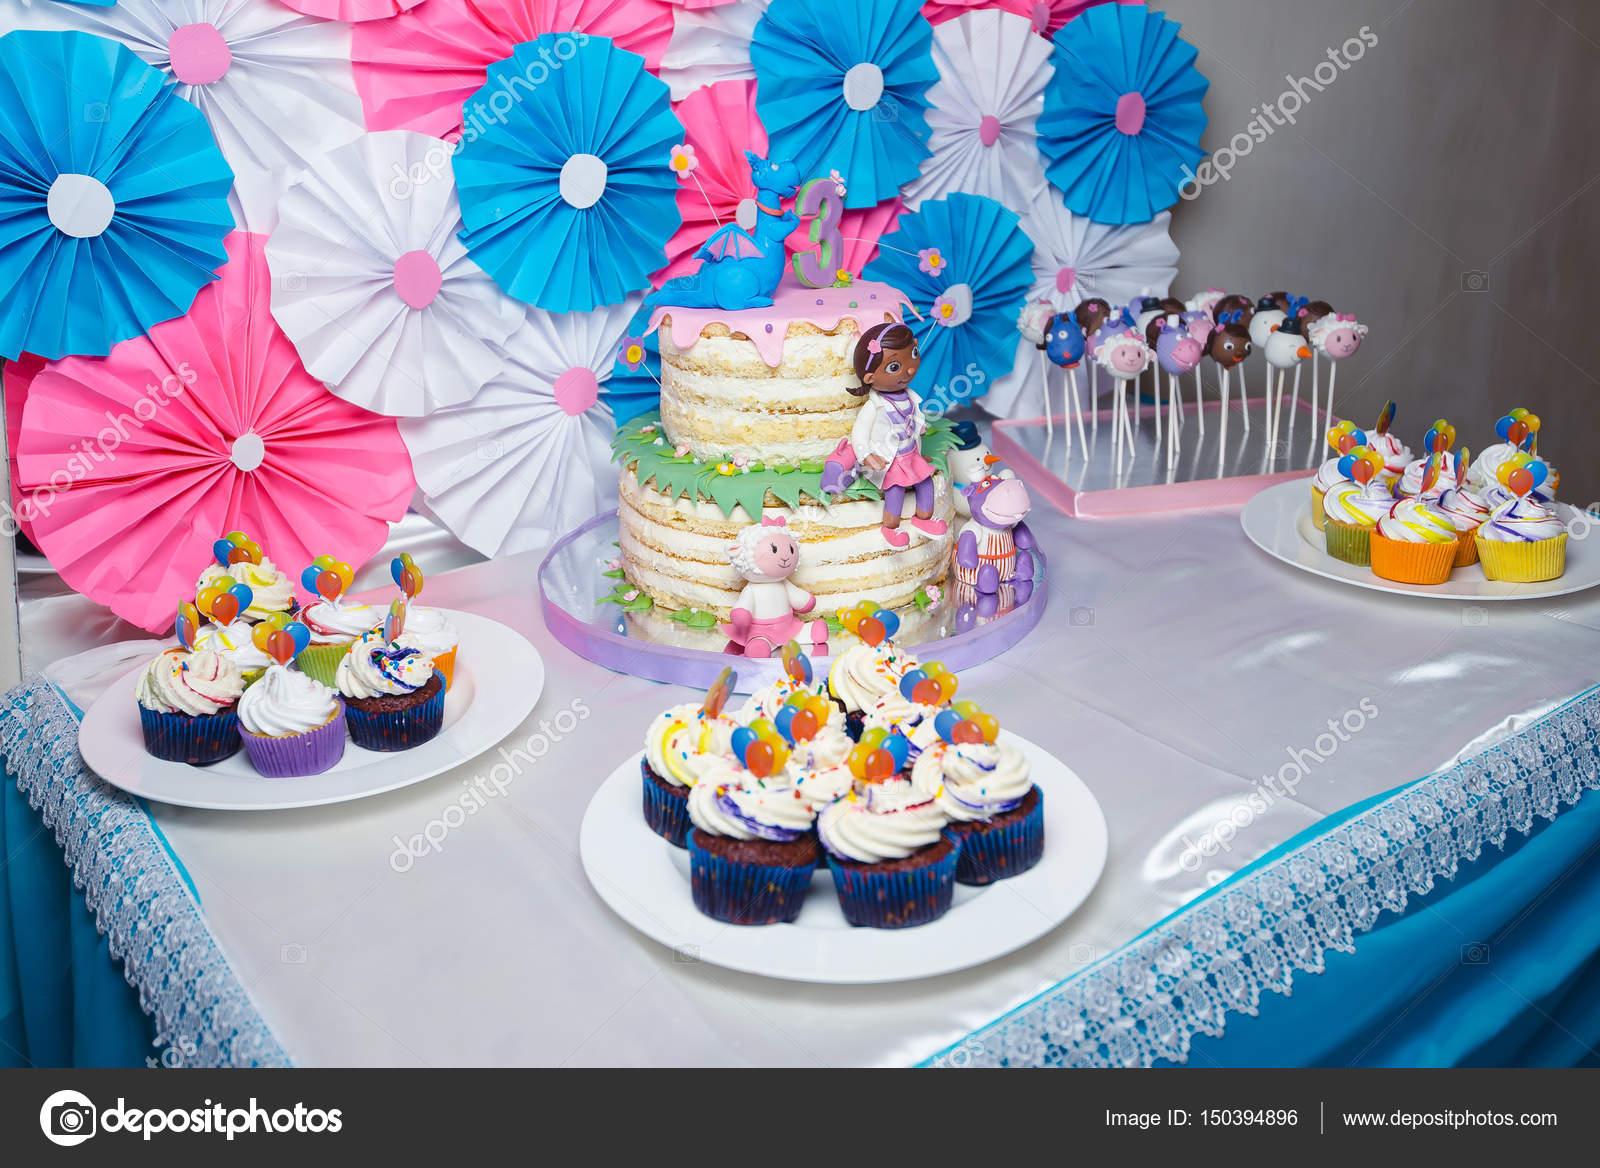 Mesa buffet decoraci n para cumplea os 3 a os foto de stock maxfoto87 150394896 - Decoracion cumpleanos anos ...